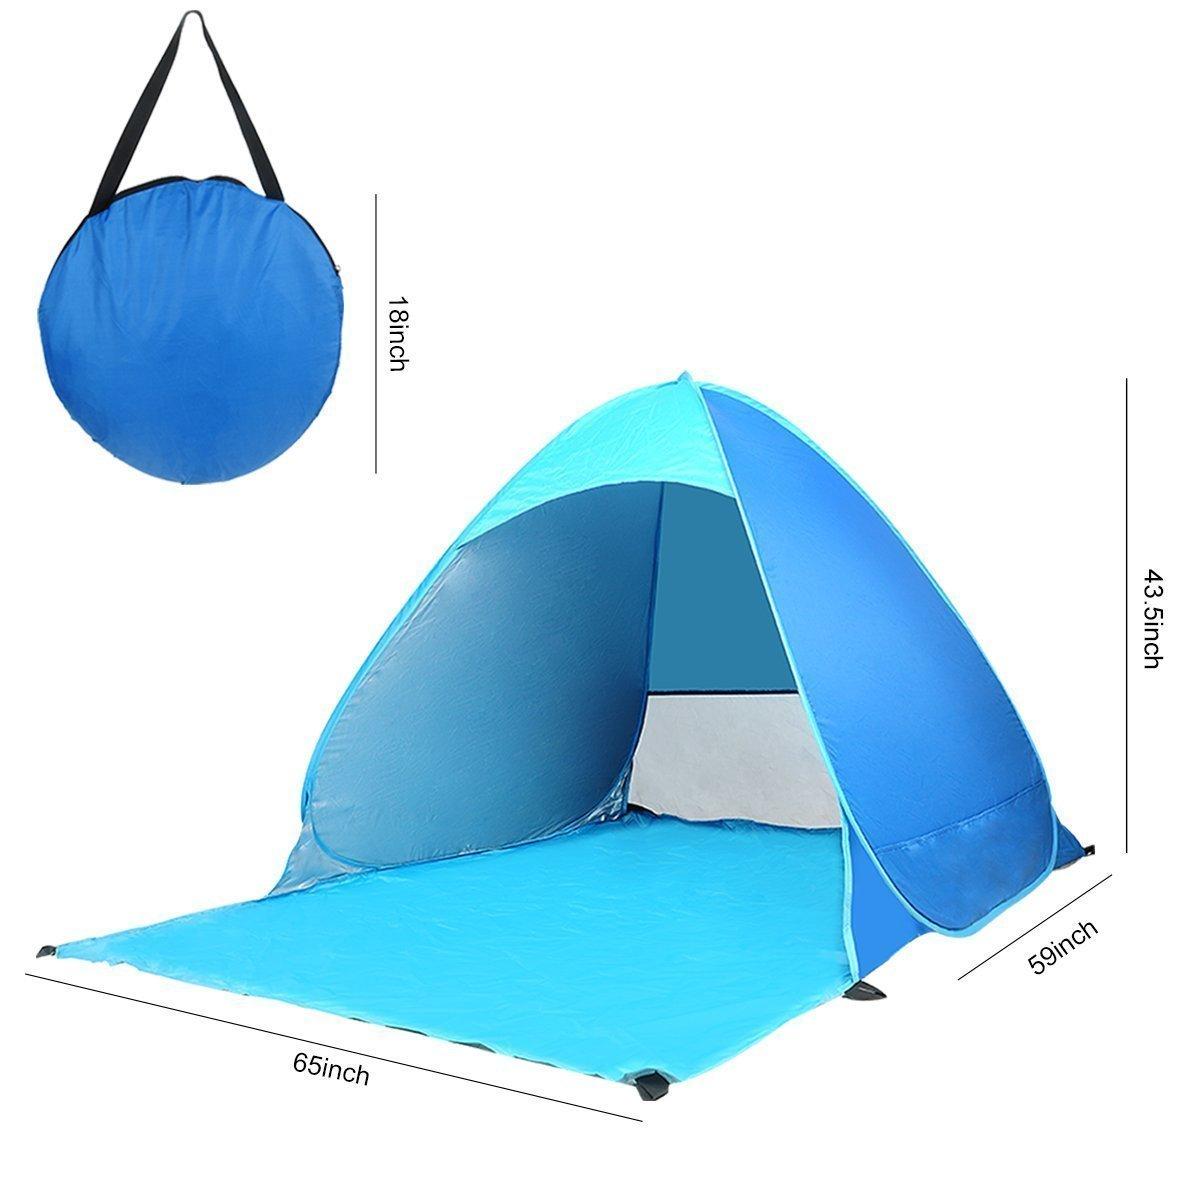 DOPTIKA Automatic Pop Up Instant Portable Outdoors Quick Cabana Beach Tent Sun Shelter Beach Umbrella Portable Cabana Shade Outdoor Pop Up Anti-UV 50+